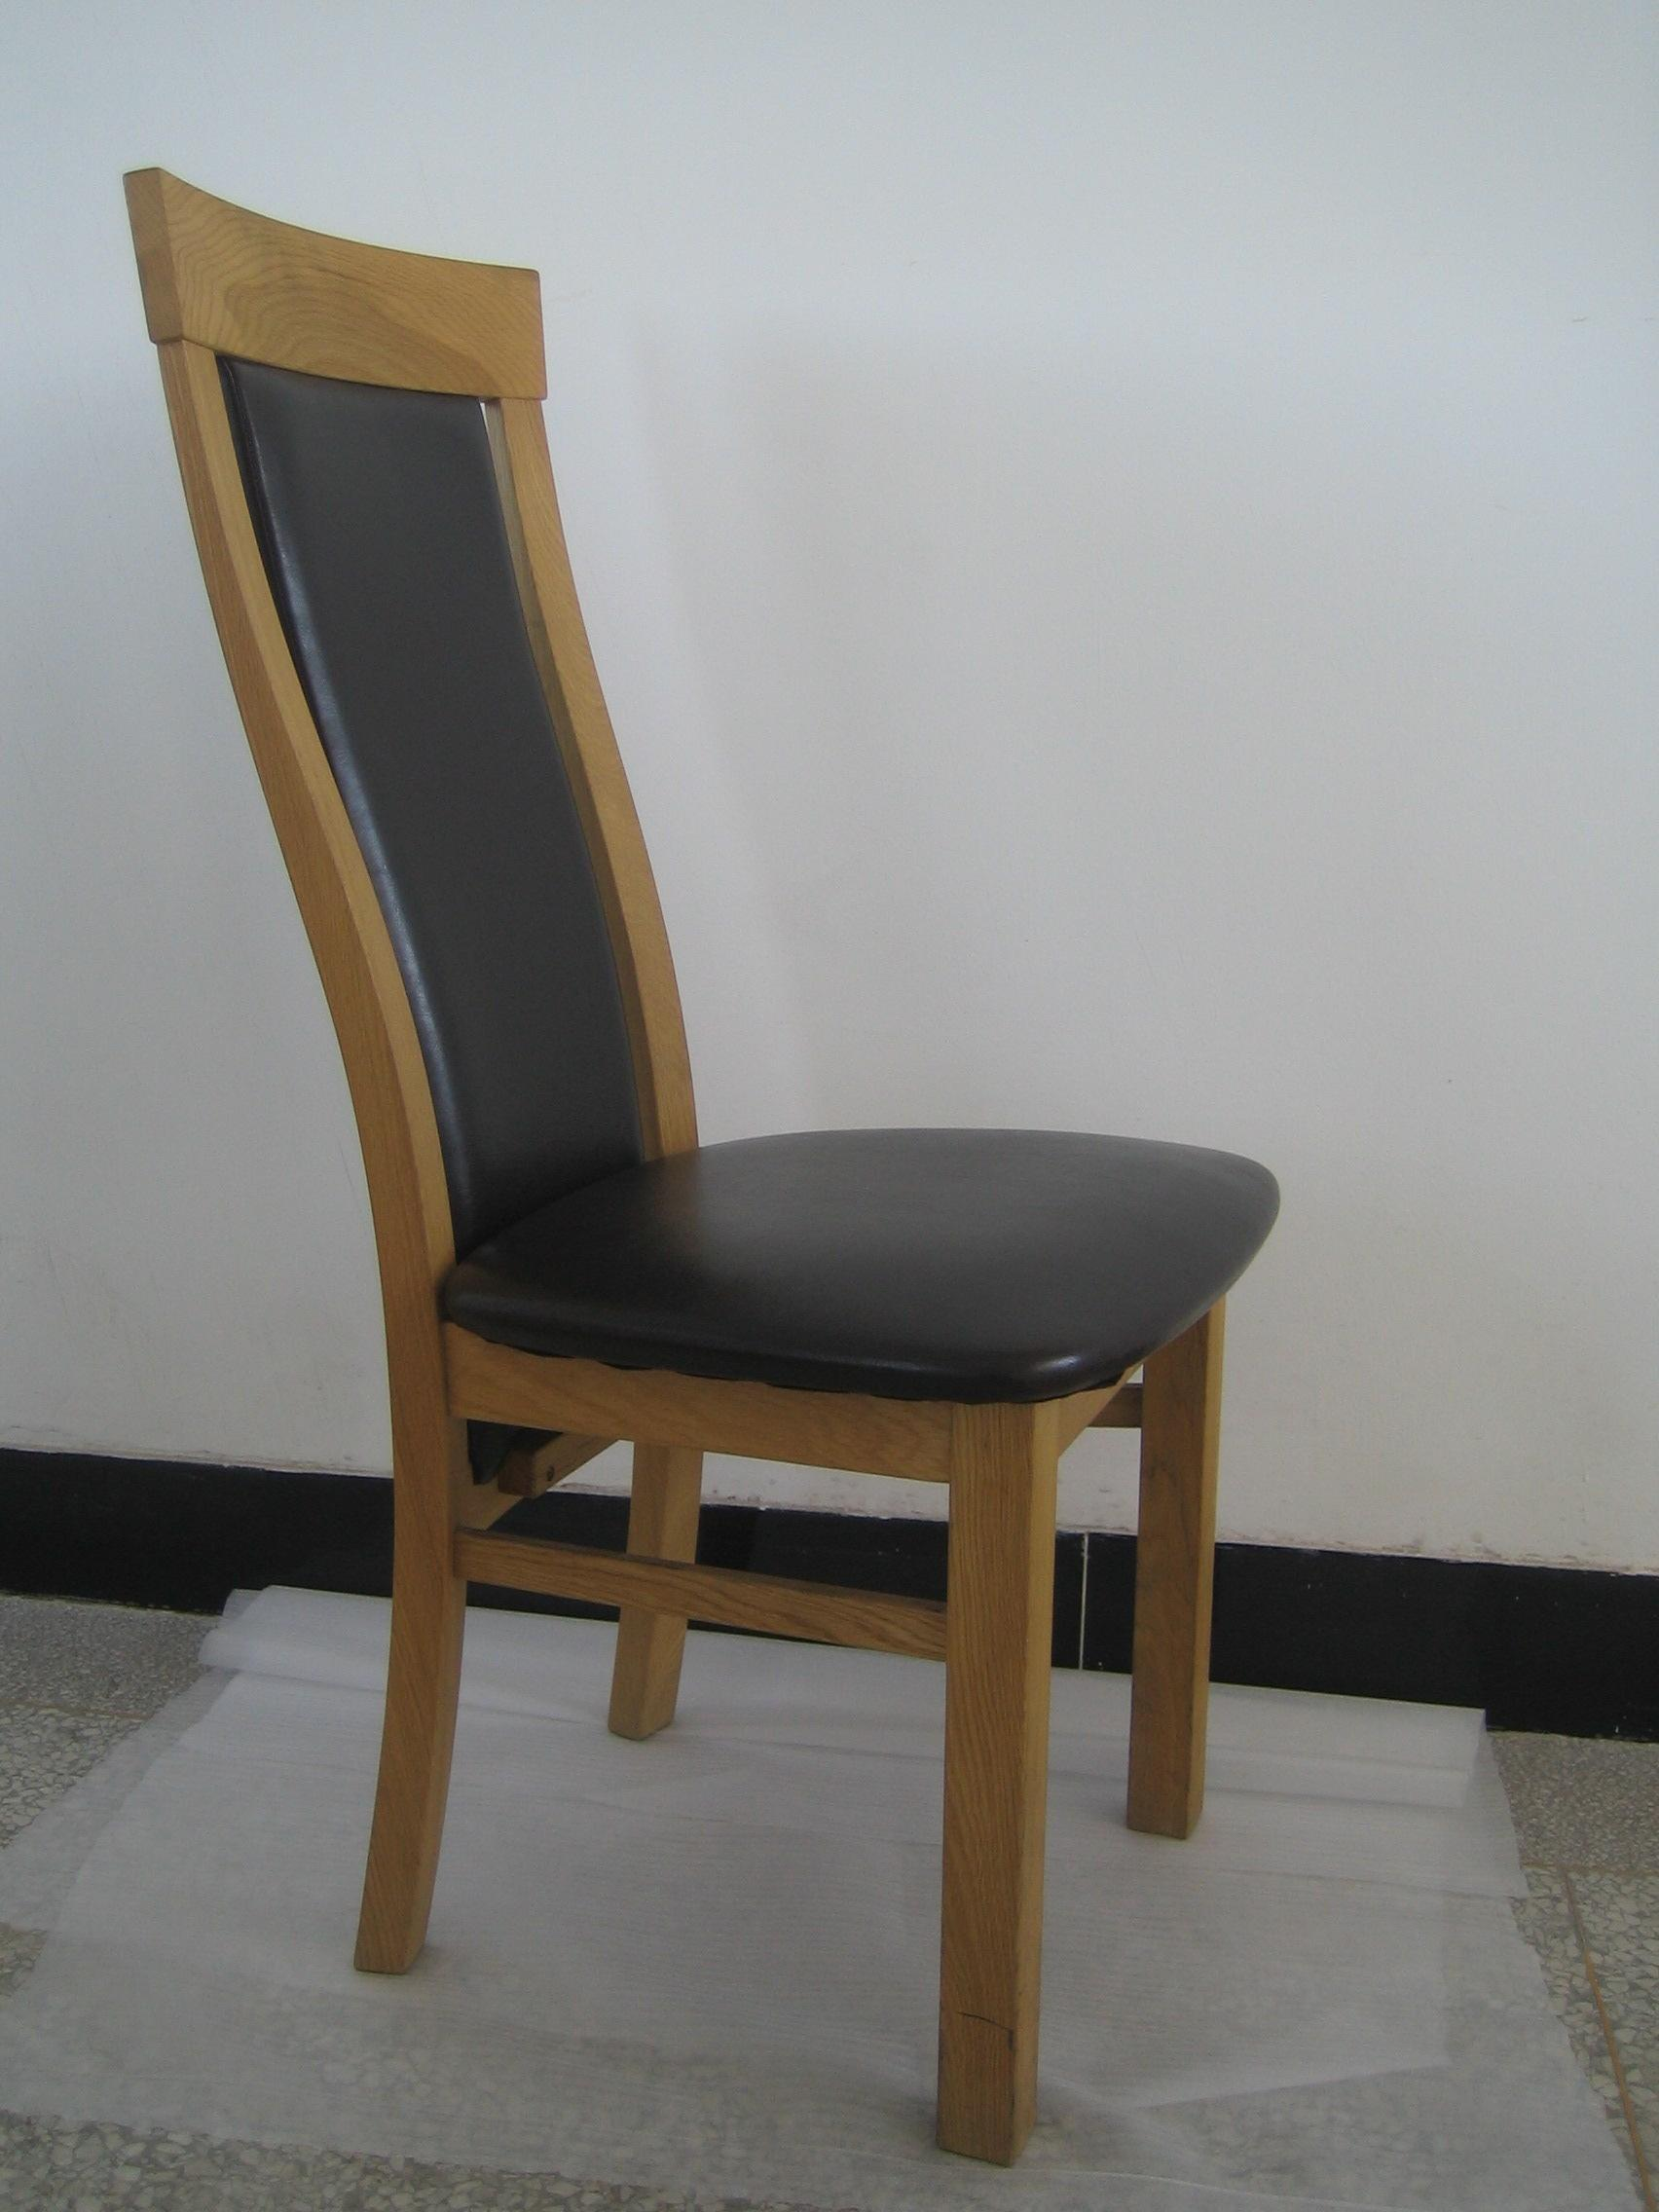 #604628 Chaise De Salle à Manger Design Espera En Bois Finit  4243 chaise de salle à manger contemporaine lutece 1704x2272 px @ aertt.com